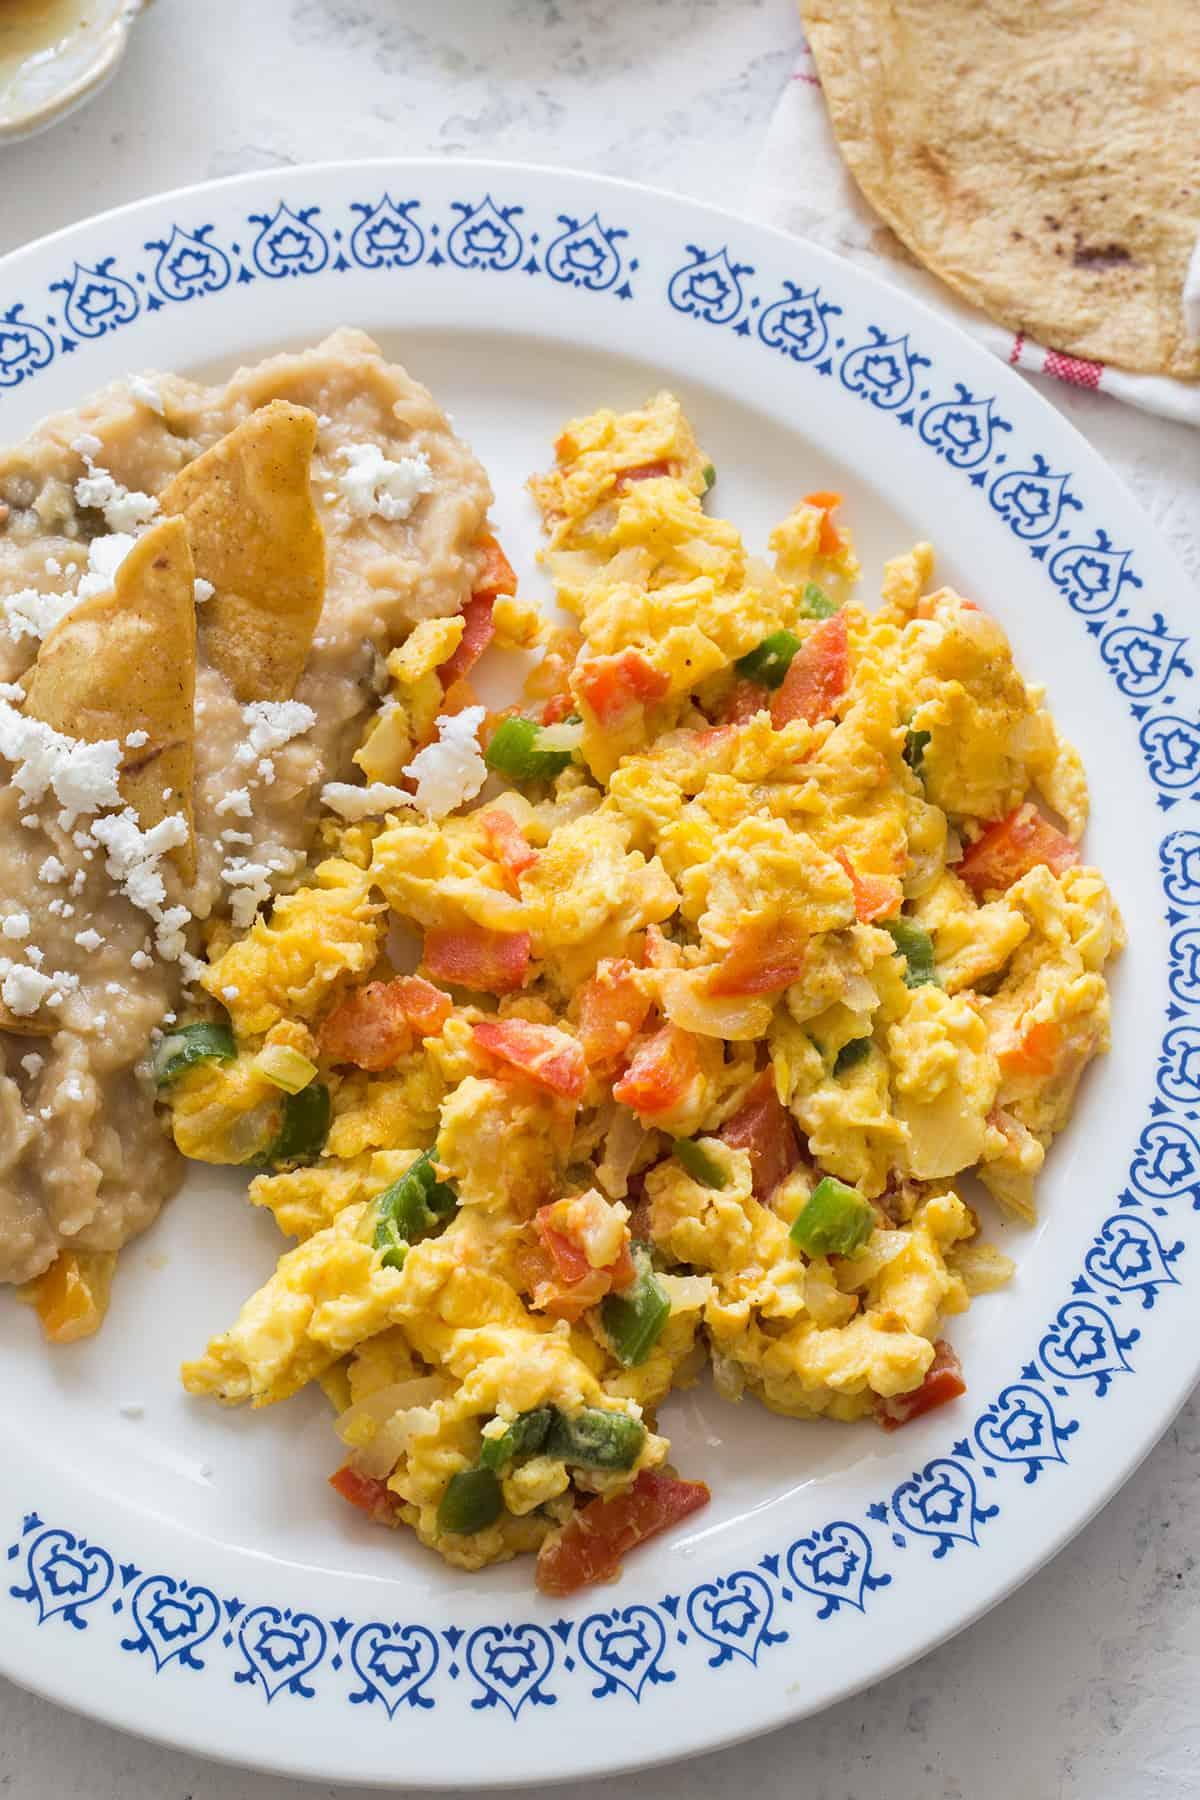 Mexican style eggs - huevos a la mexicana